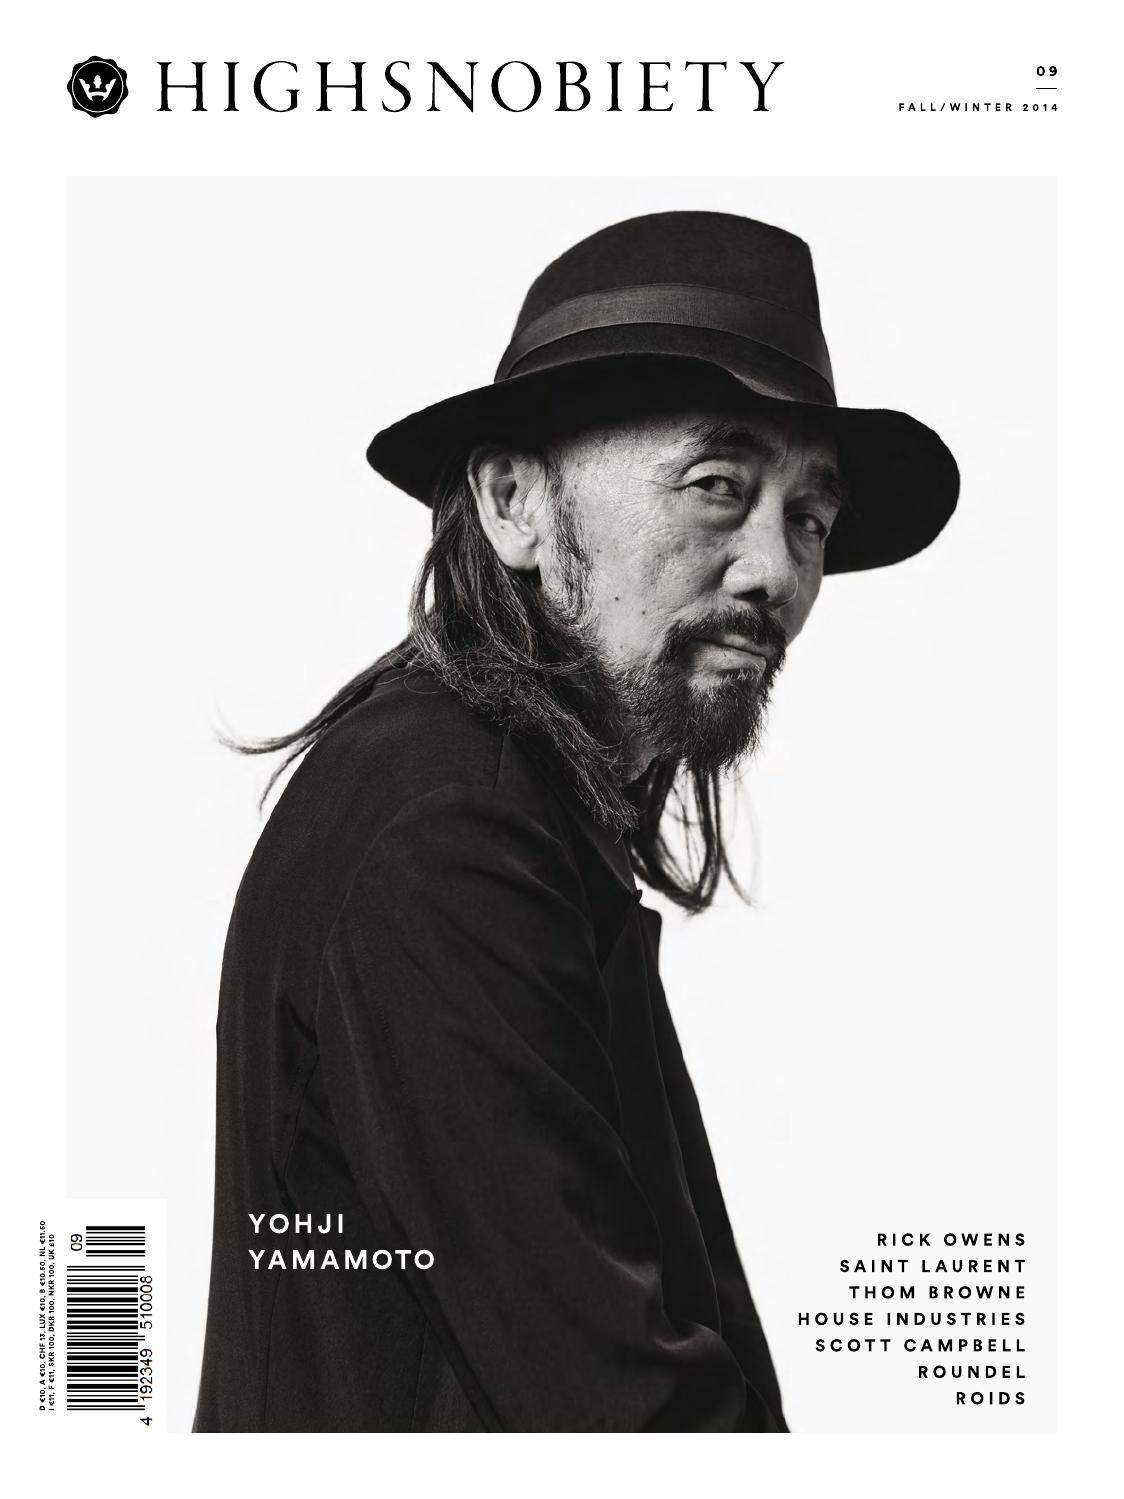 quality design 35516 6c97f Highsnobiety Magazine 09 - Winter 2014 by HIGHSNOBIETY - issuu